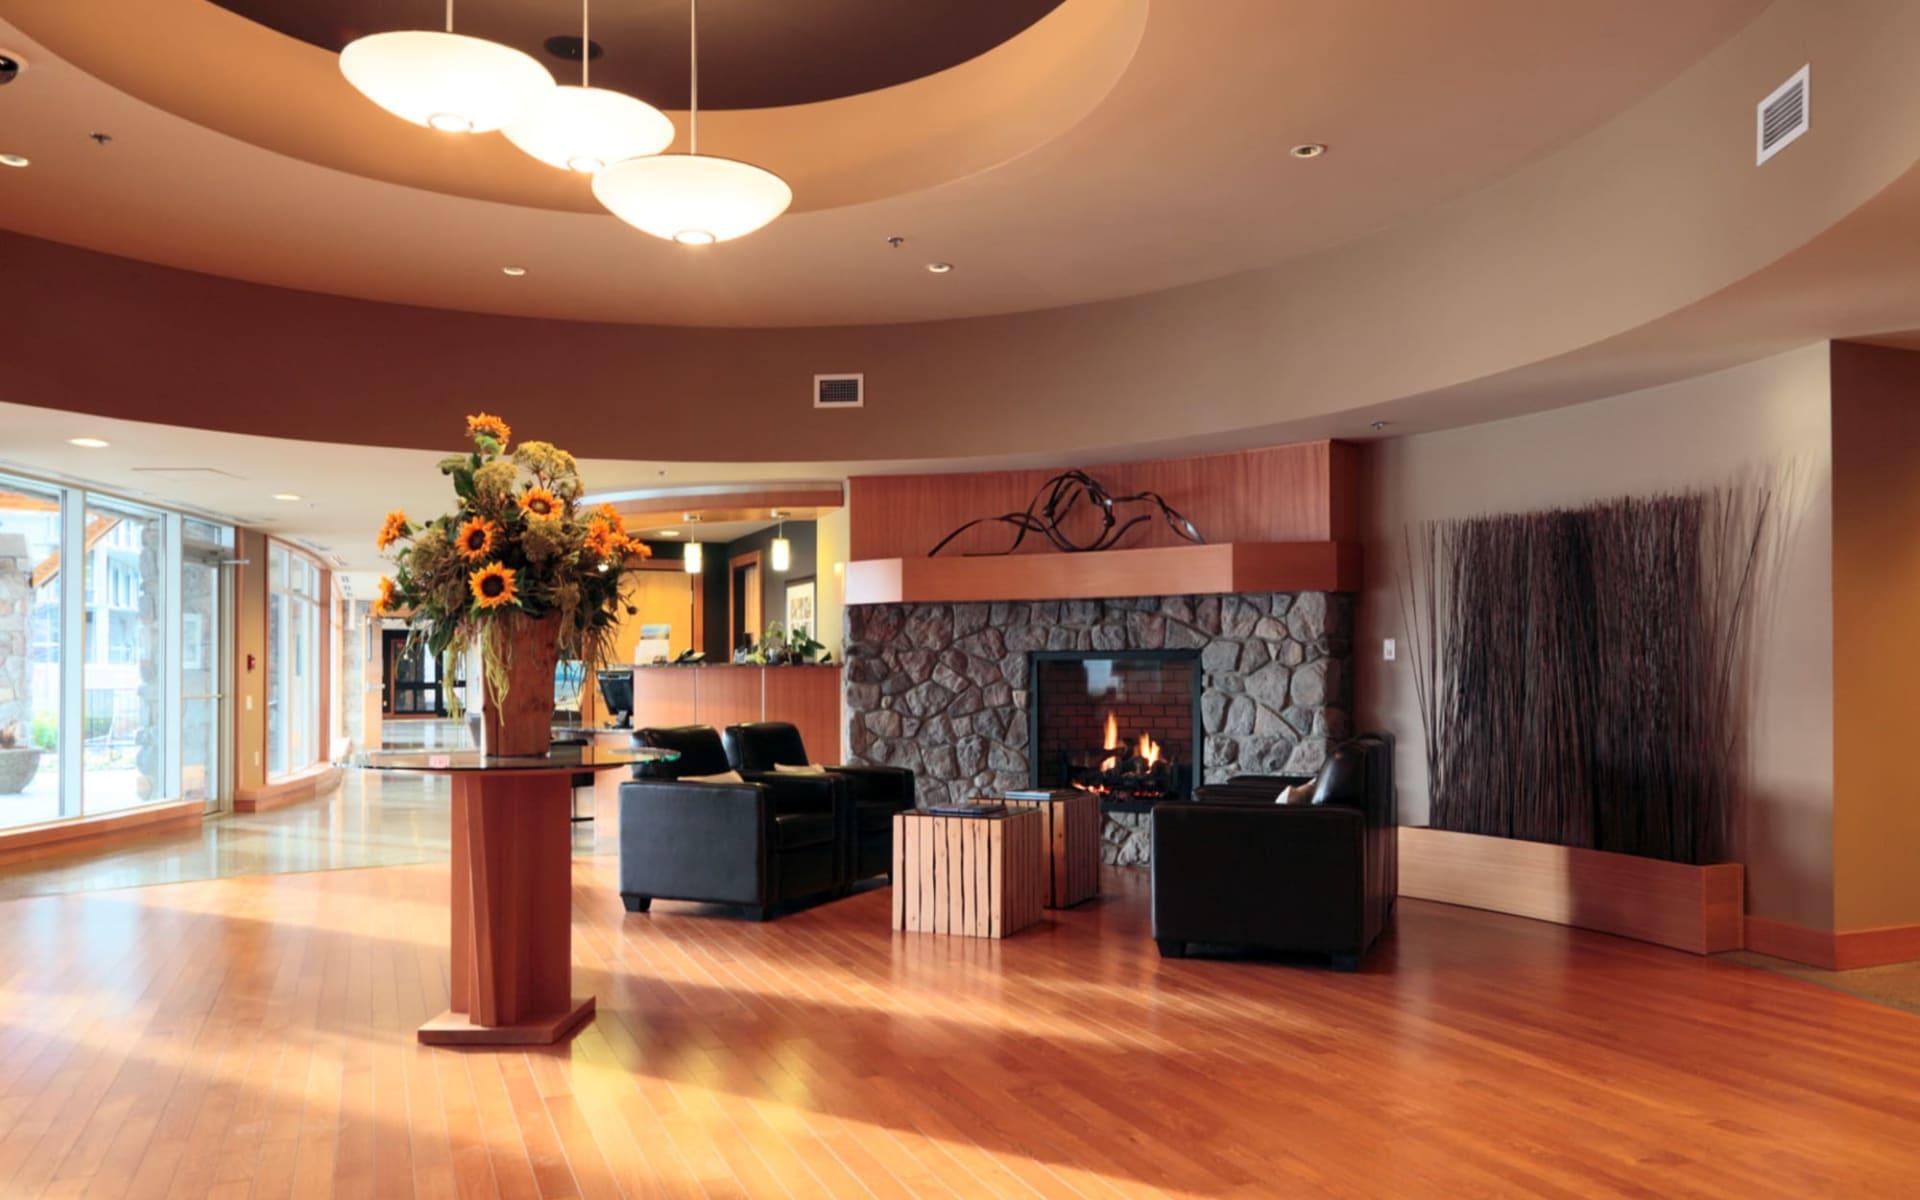 The Beach Club Resort in Parksville:  Beach Club Resort_Lobby